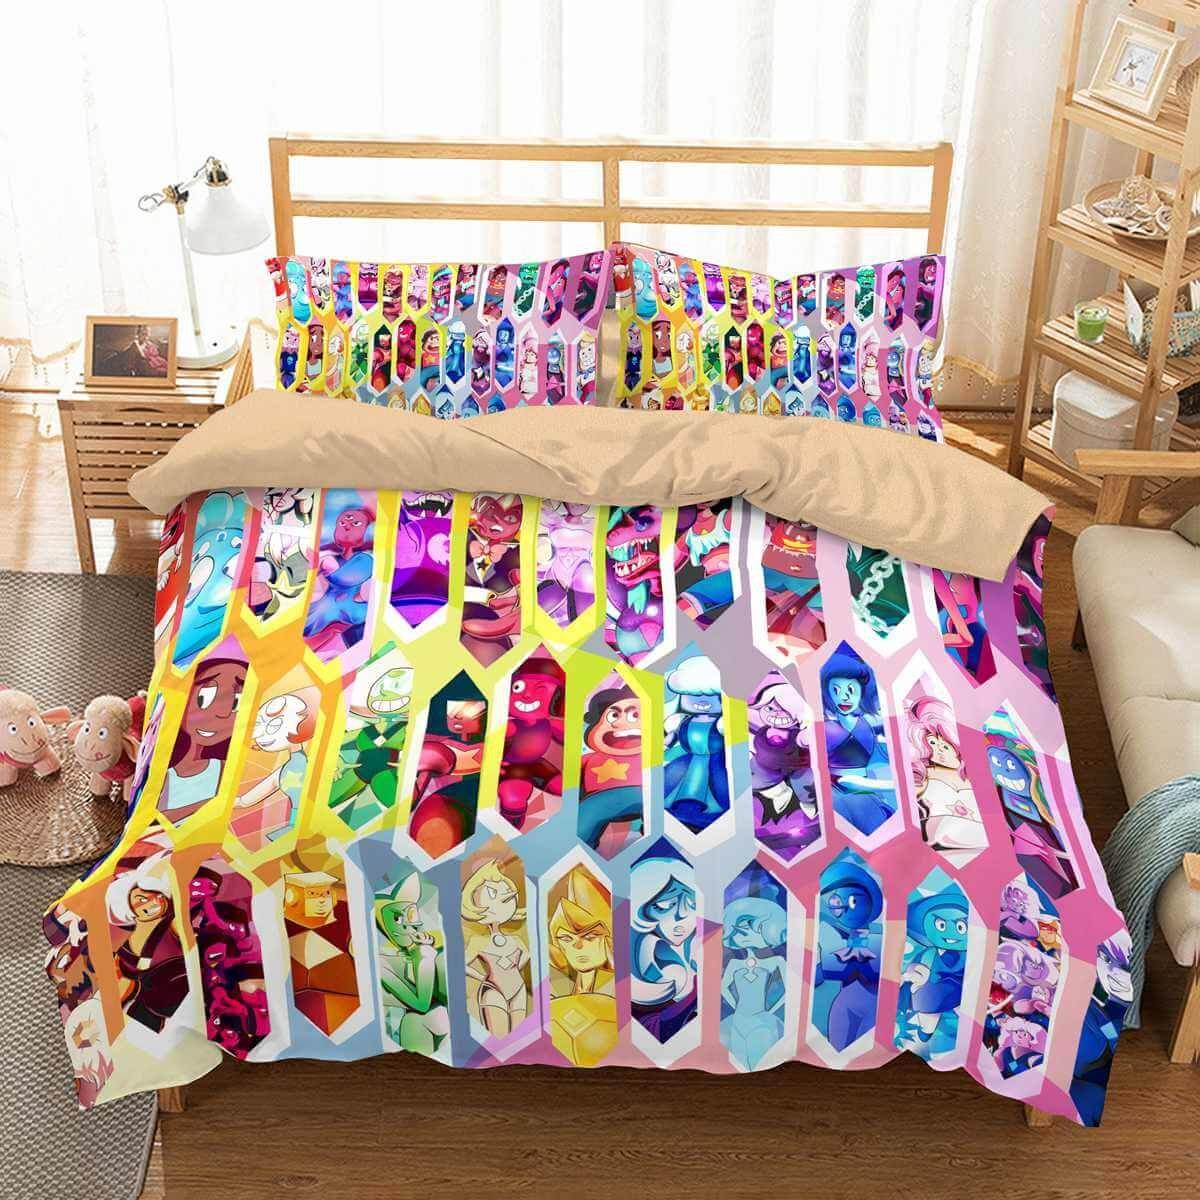 7d6d6cf26b61 3D Customize Steven Universe Bedding Set Duvet Cover Set Bedroom Set  Bedlinen 1)100% Microfiber,Soft and Comfortable. 2)Environmental  Dyeing,Never Lose ...